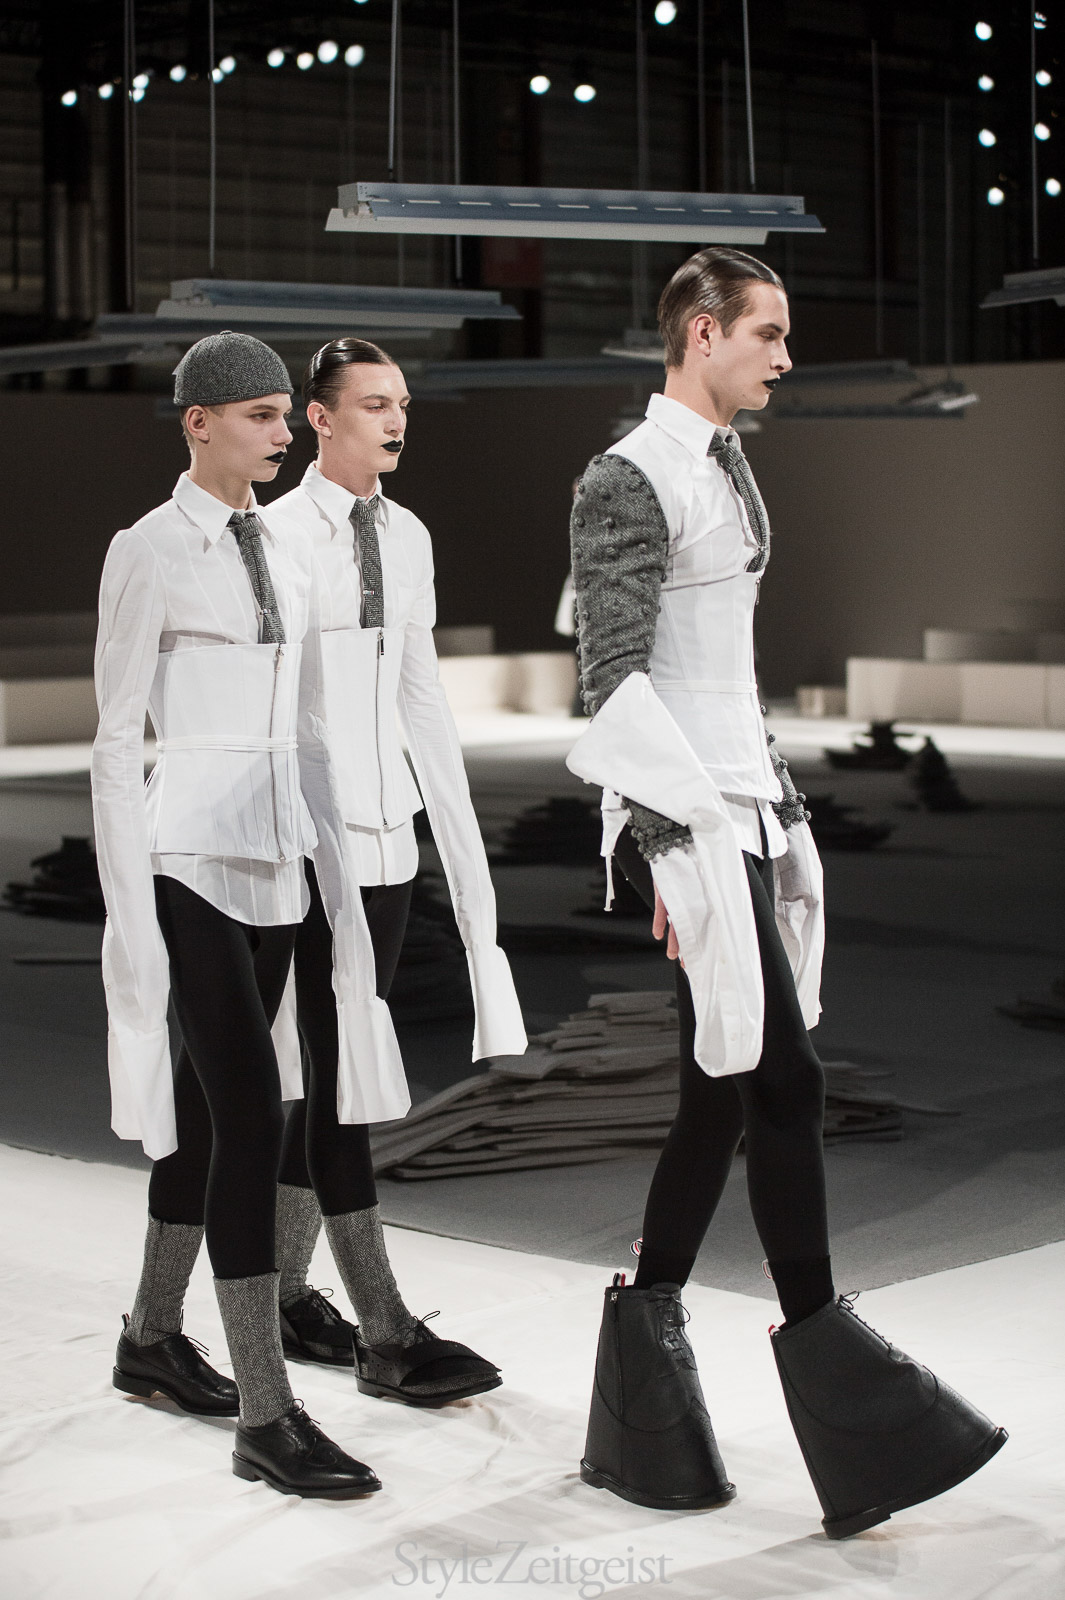 Thom Browne F/W17 Men's - Paris - fashion - Thom Browne, PFW, Patrick LaDuke, Paris, MENSWEAR, FW17, Fashion StyleZeitgeist, Fall Winter, 2017